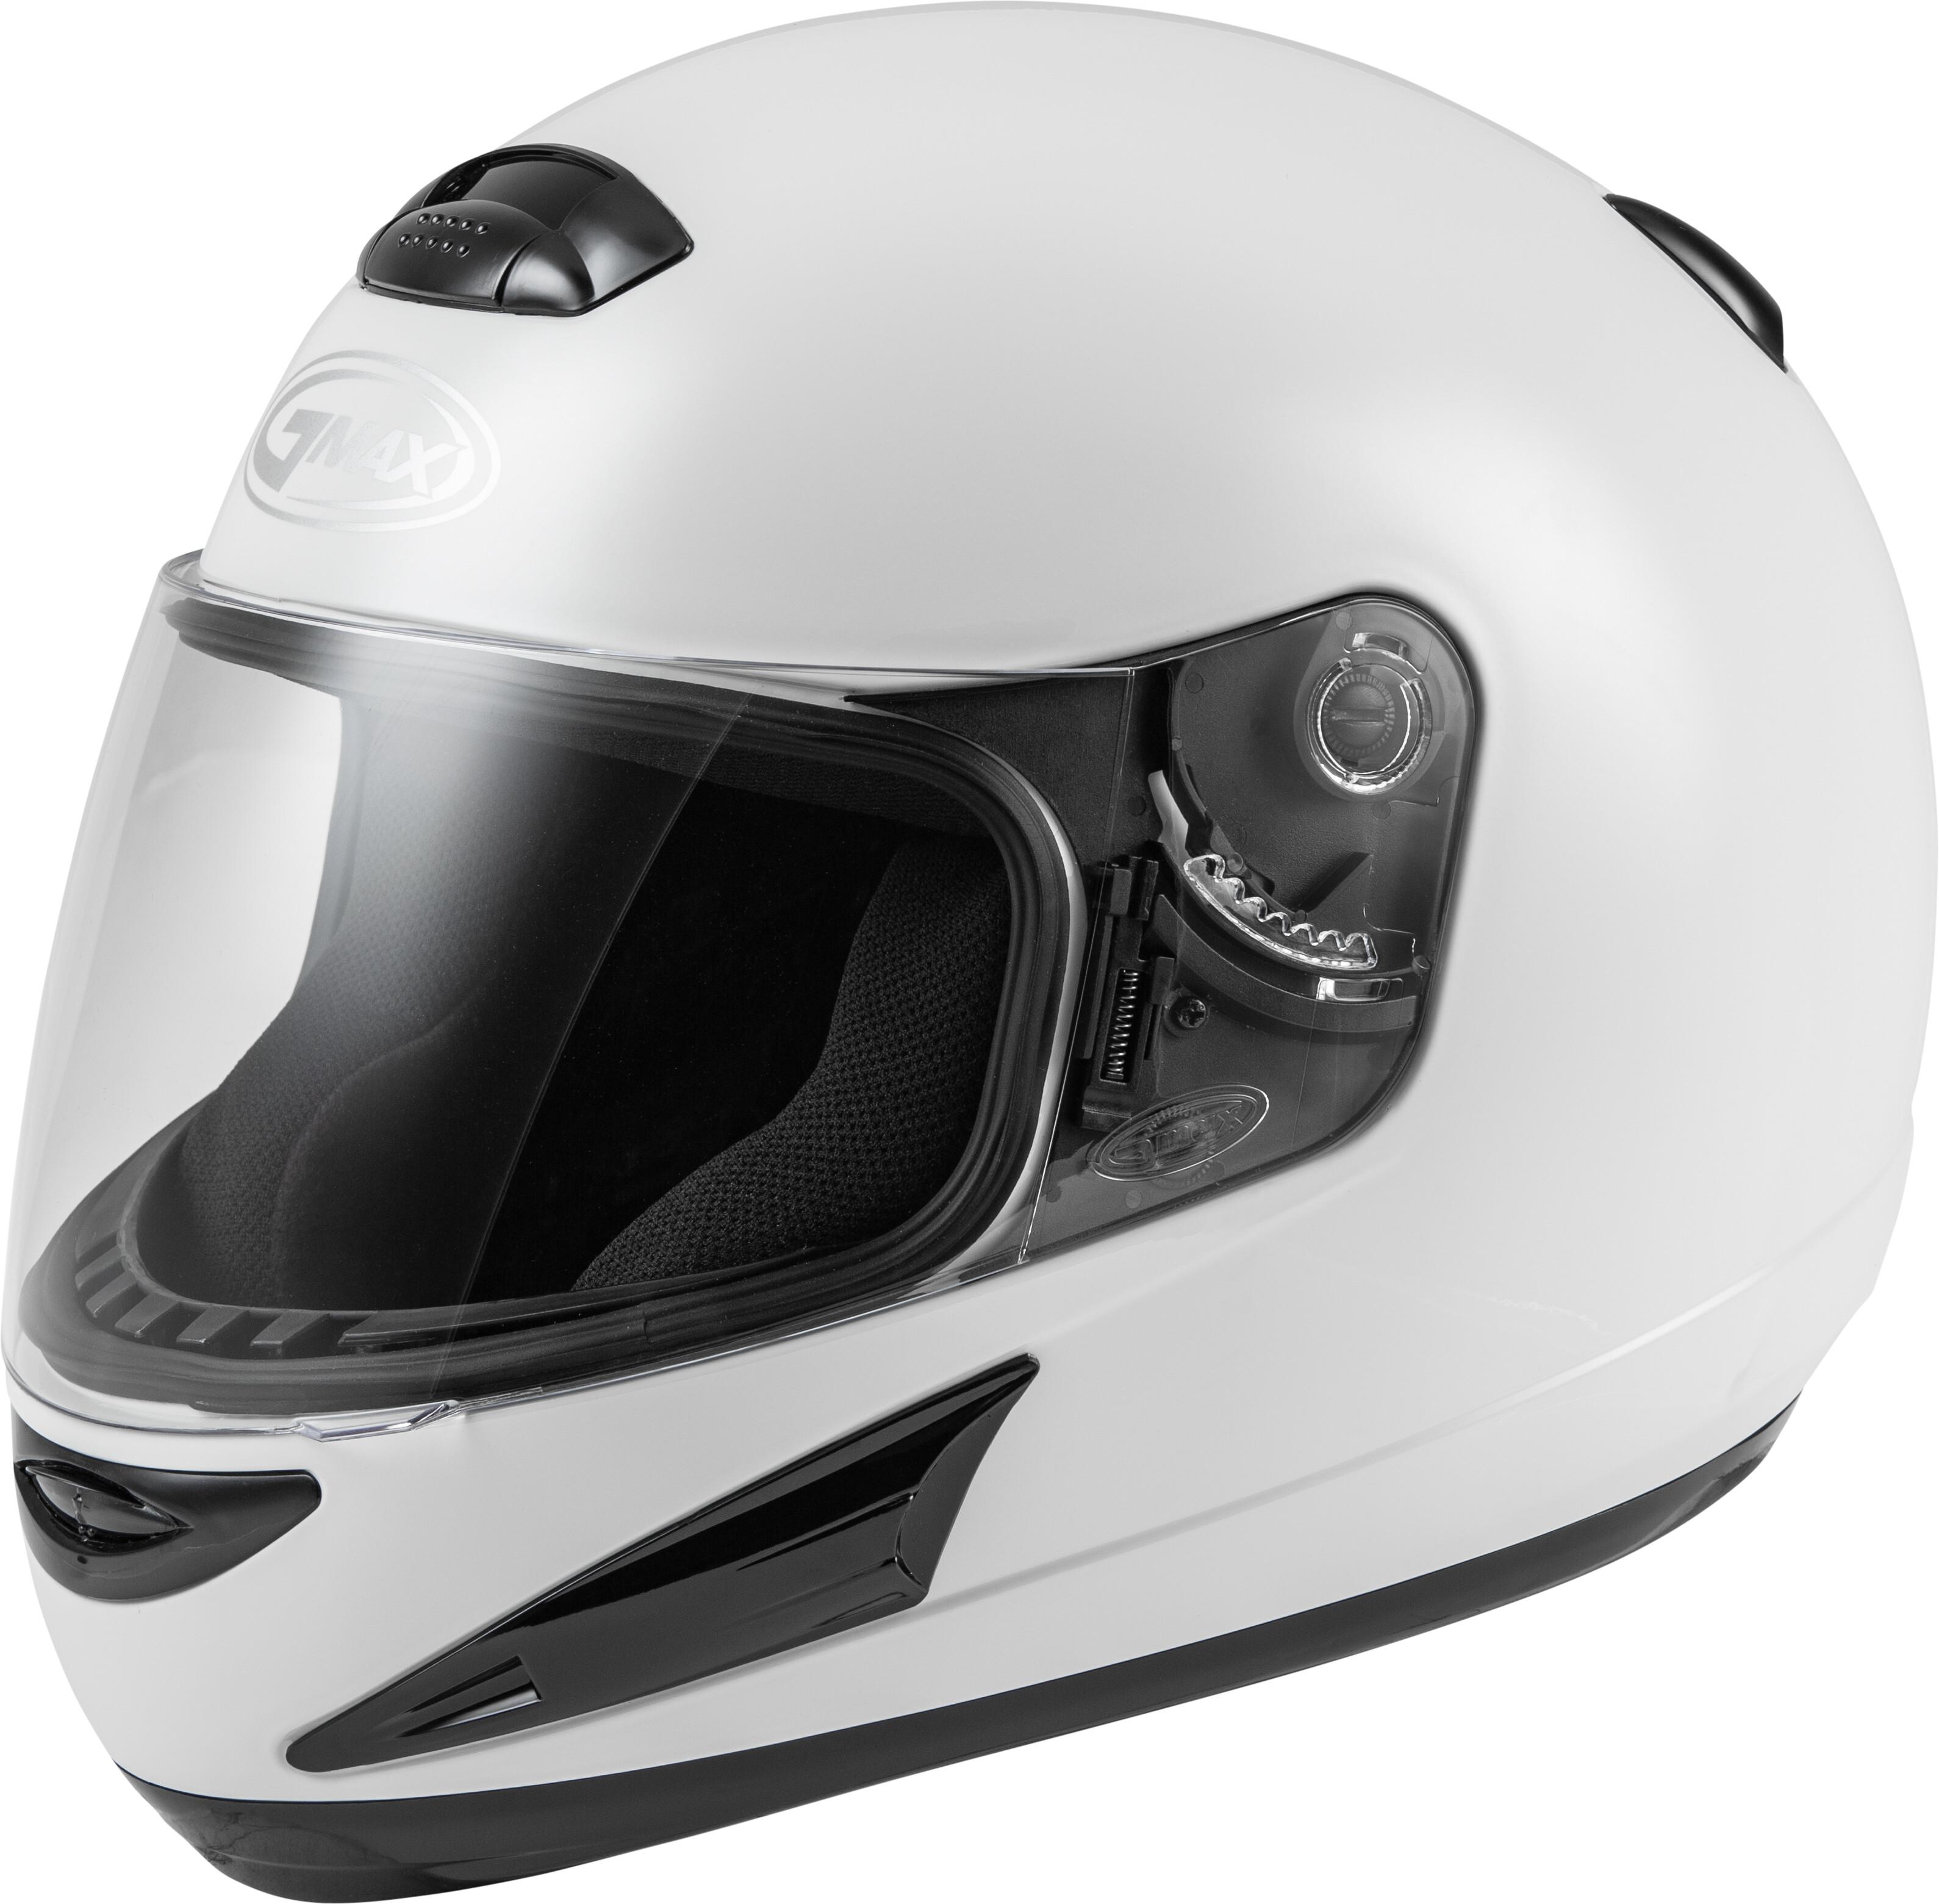 GM-38 Helmet